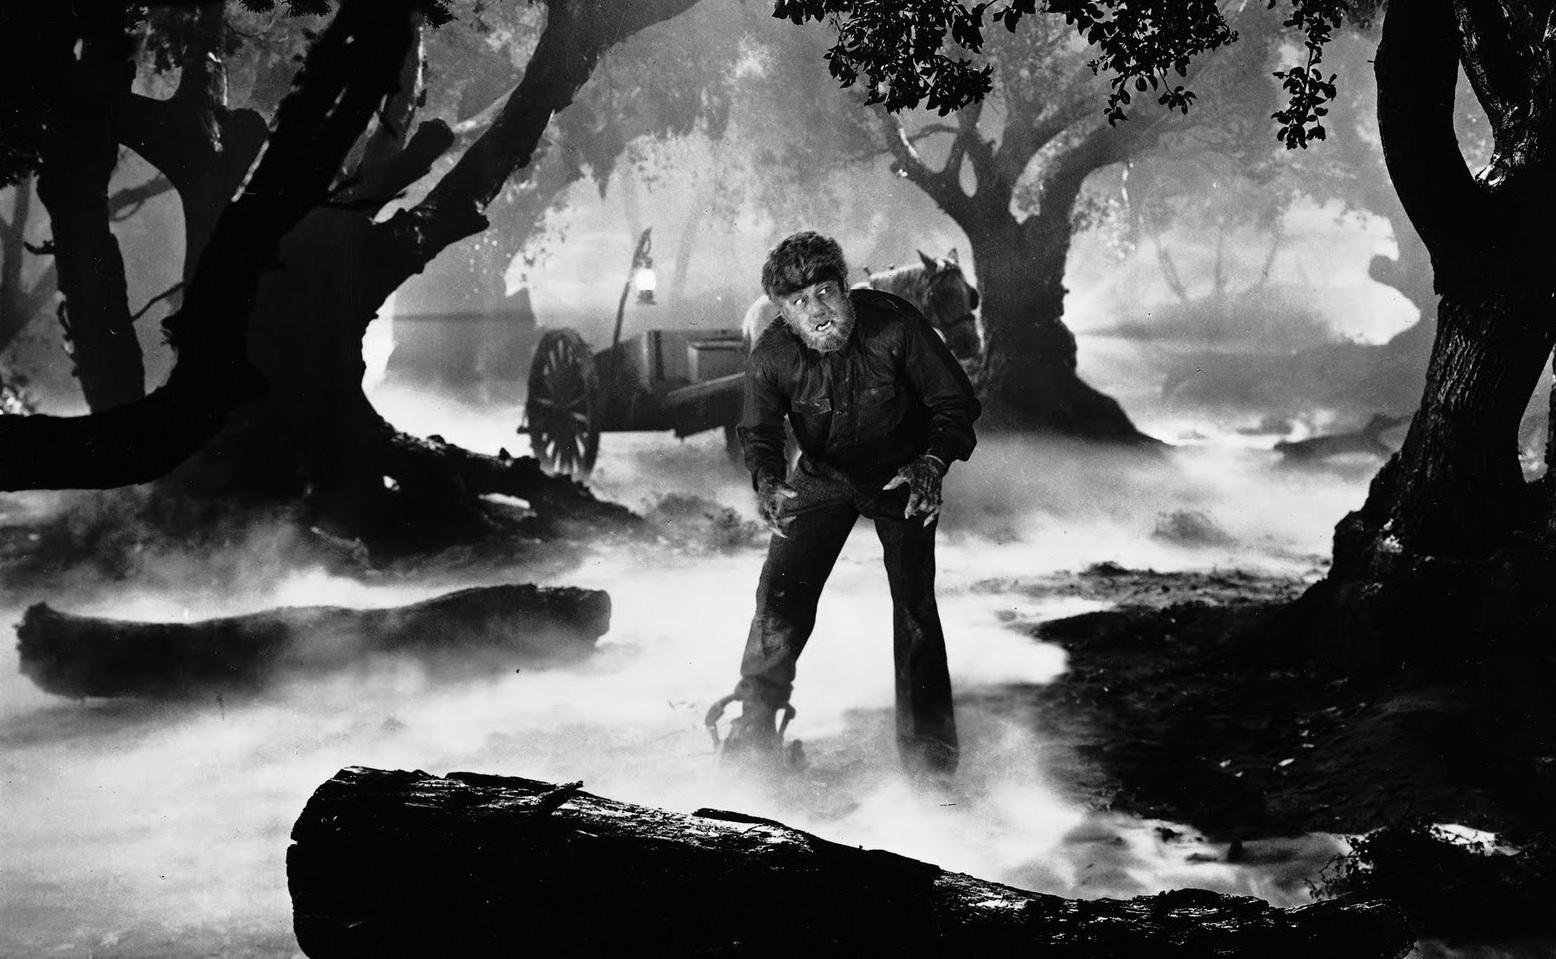 The-Wolf-Man-1941.jpg